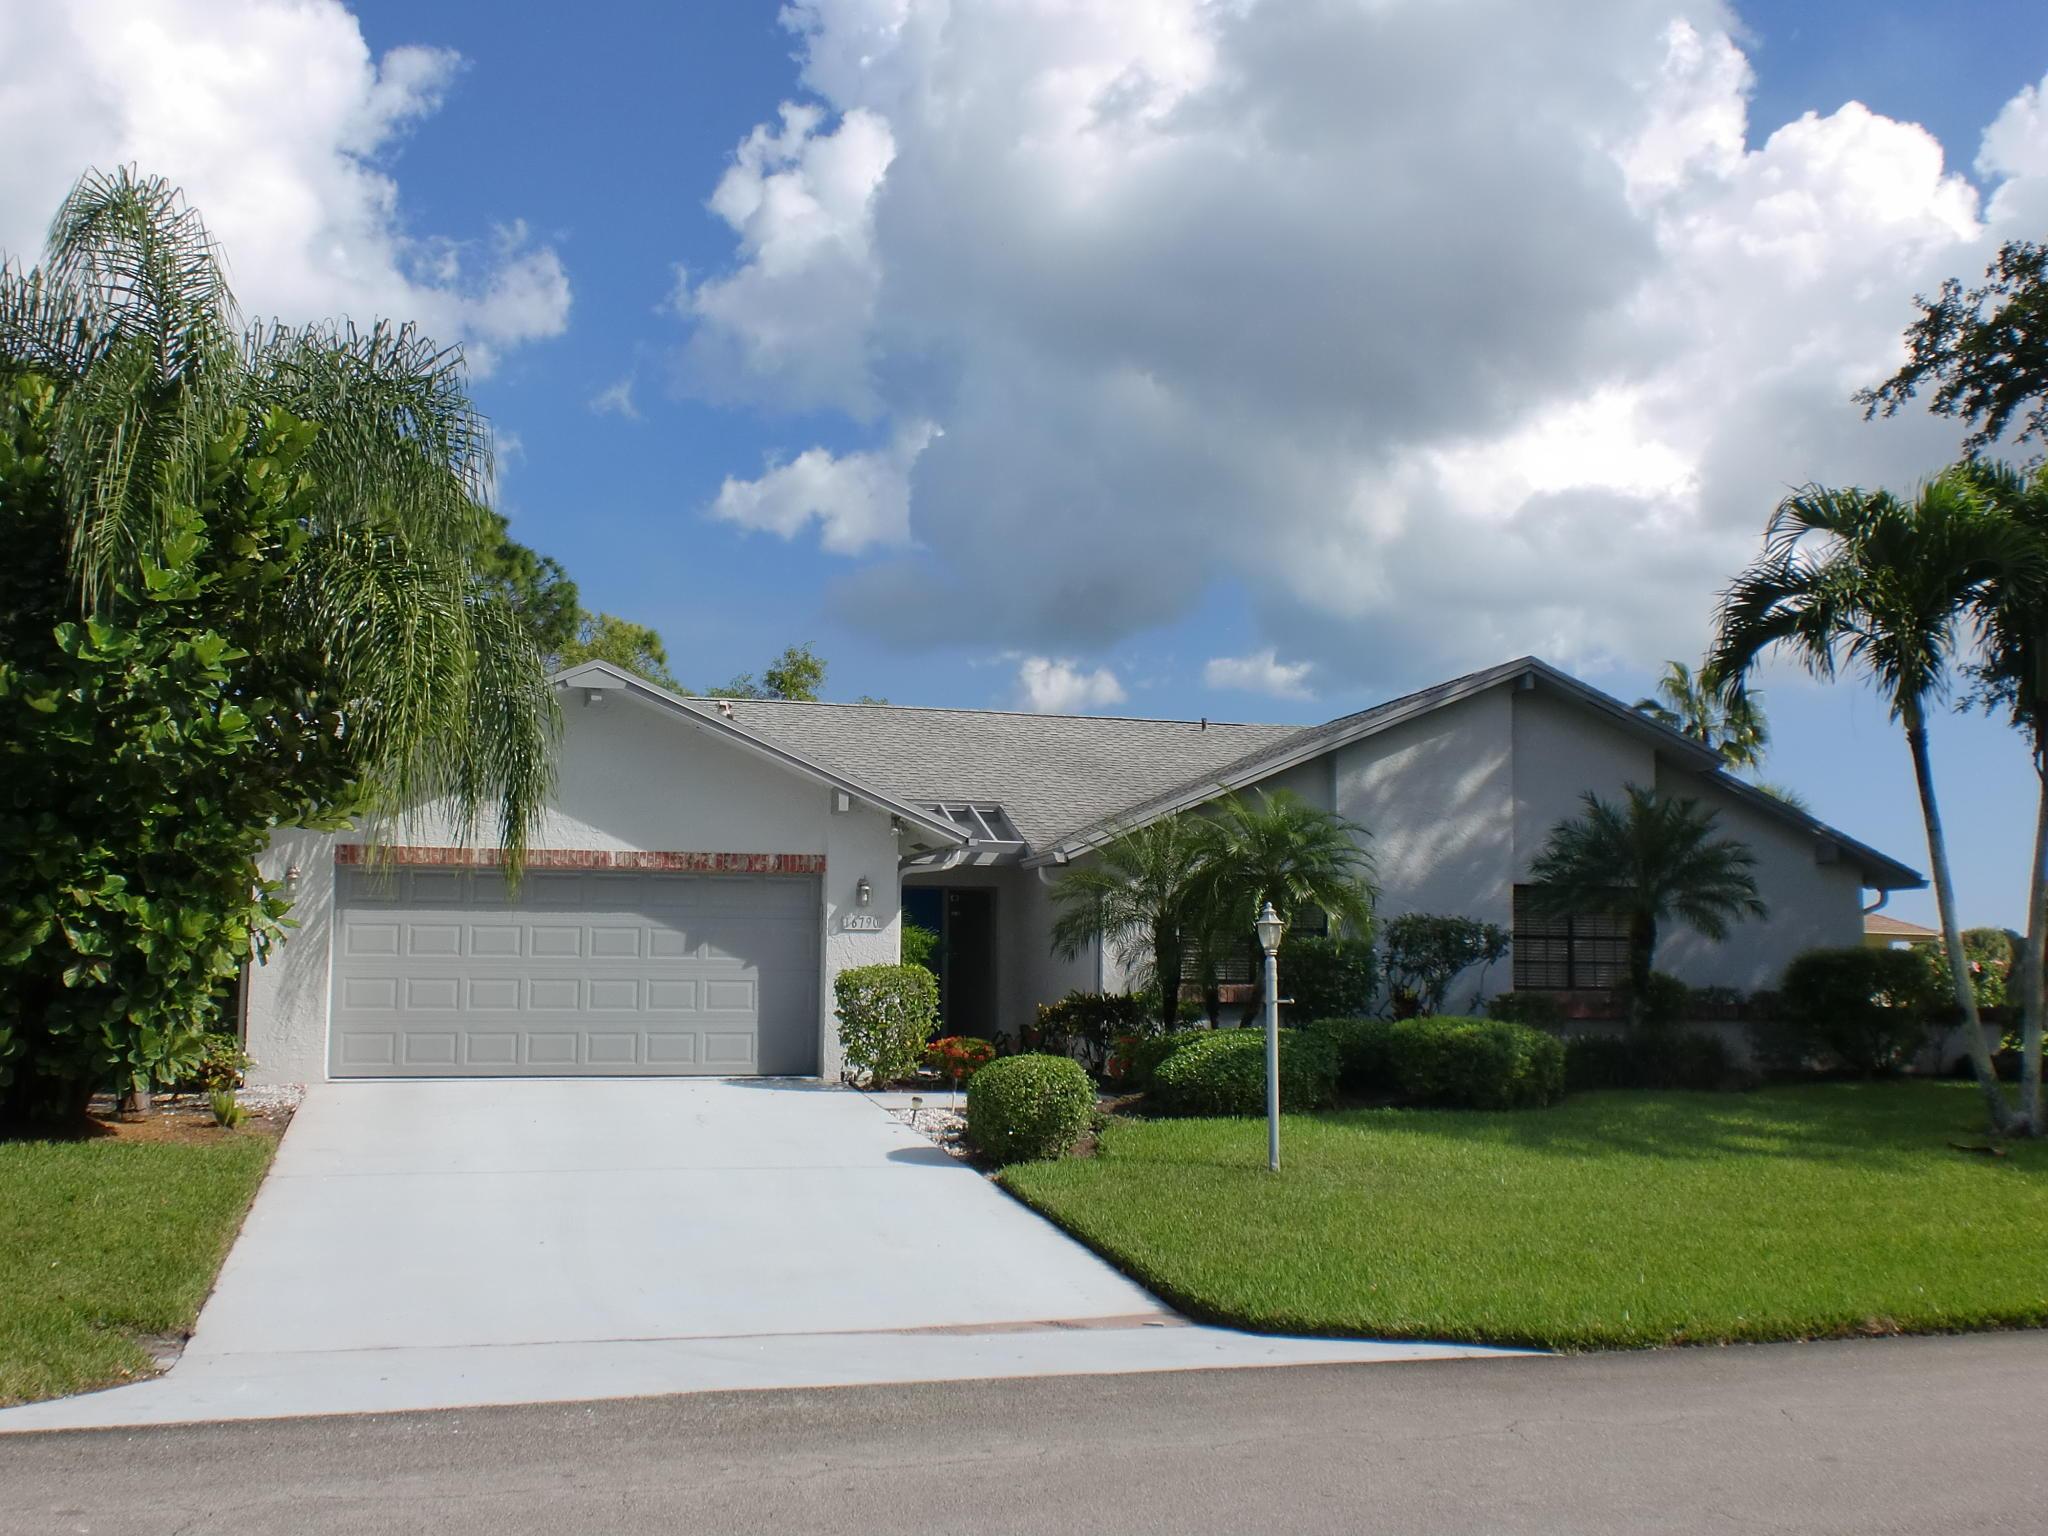 16790 Boca Delray Drive  Delray Beach, FL 33484